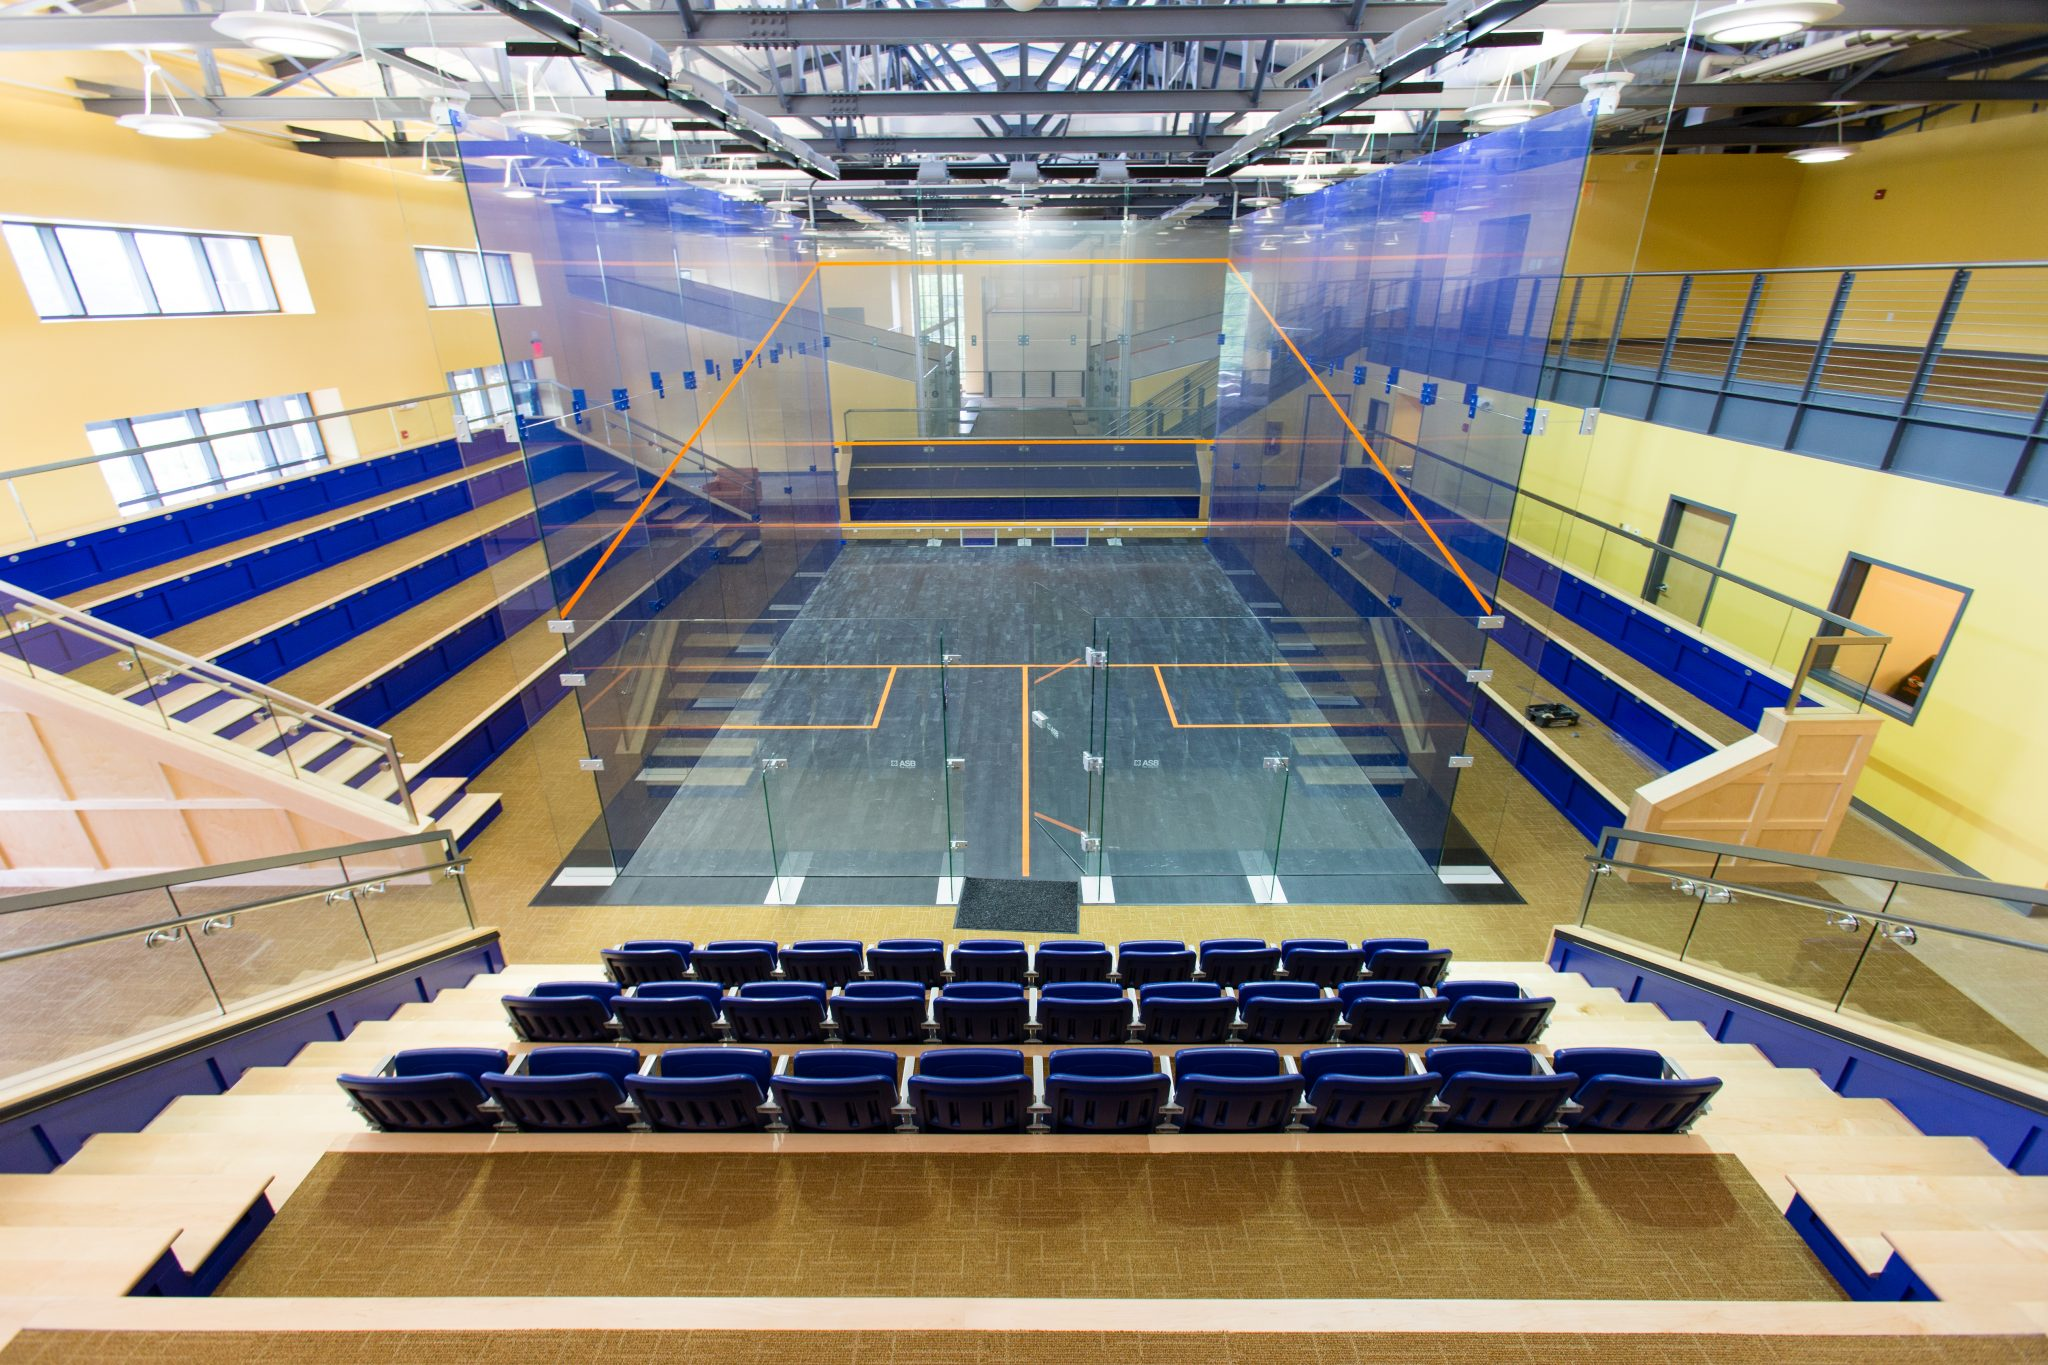 UVA McArthur Squash Center Awarded LEED Certified Status